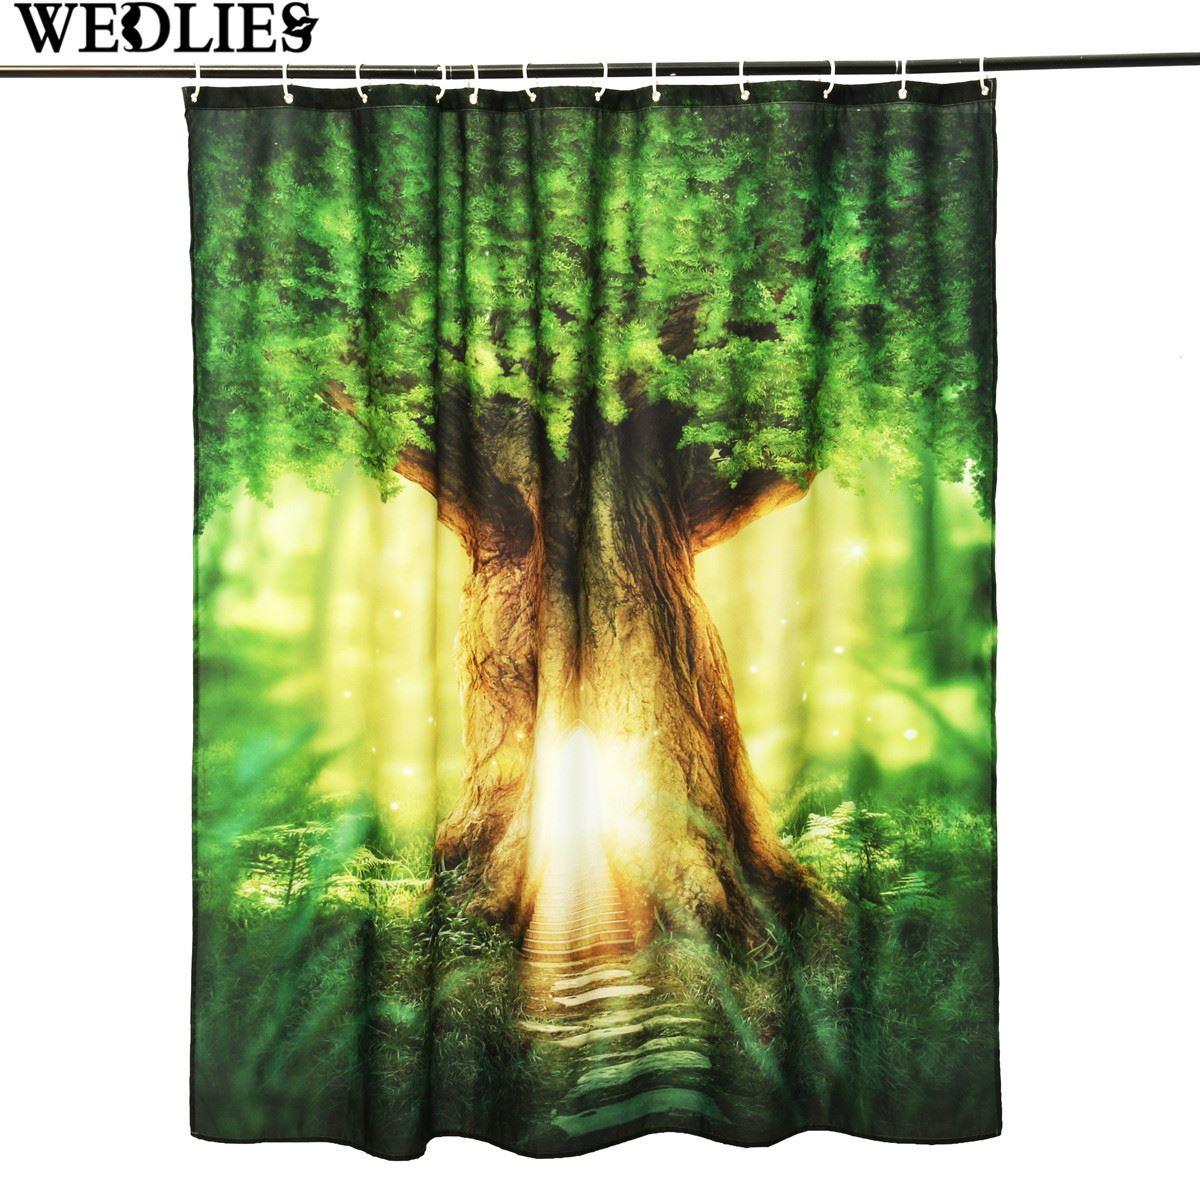 Shower curtain custom modern sunshine big tree bath screens fabric waterproof bathroom polyester panel sheer decor